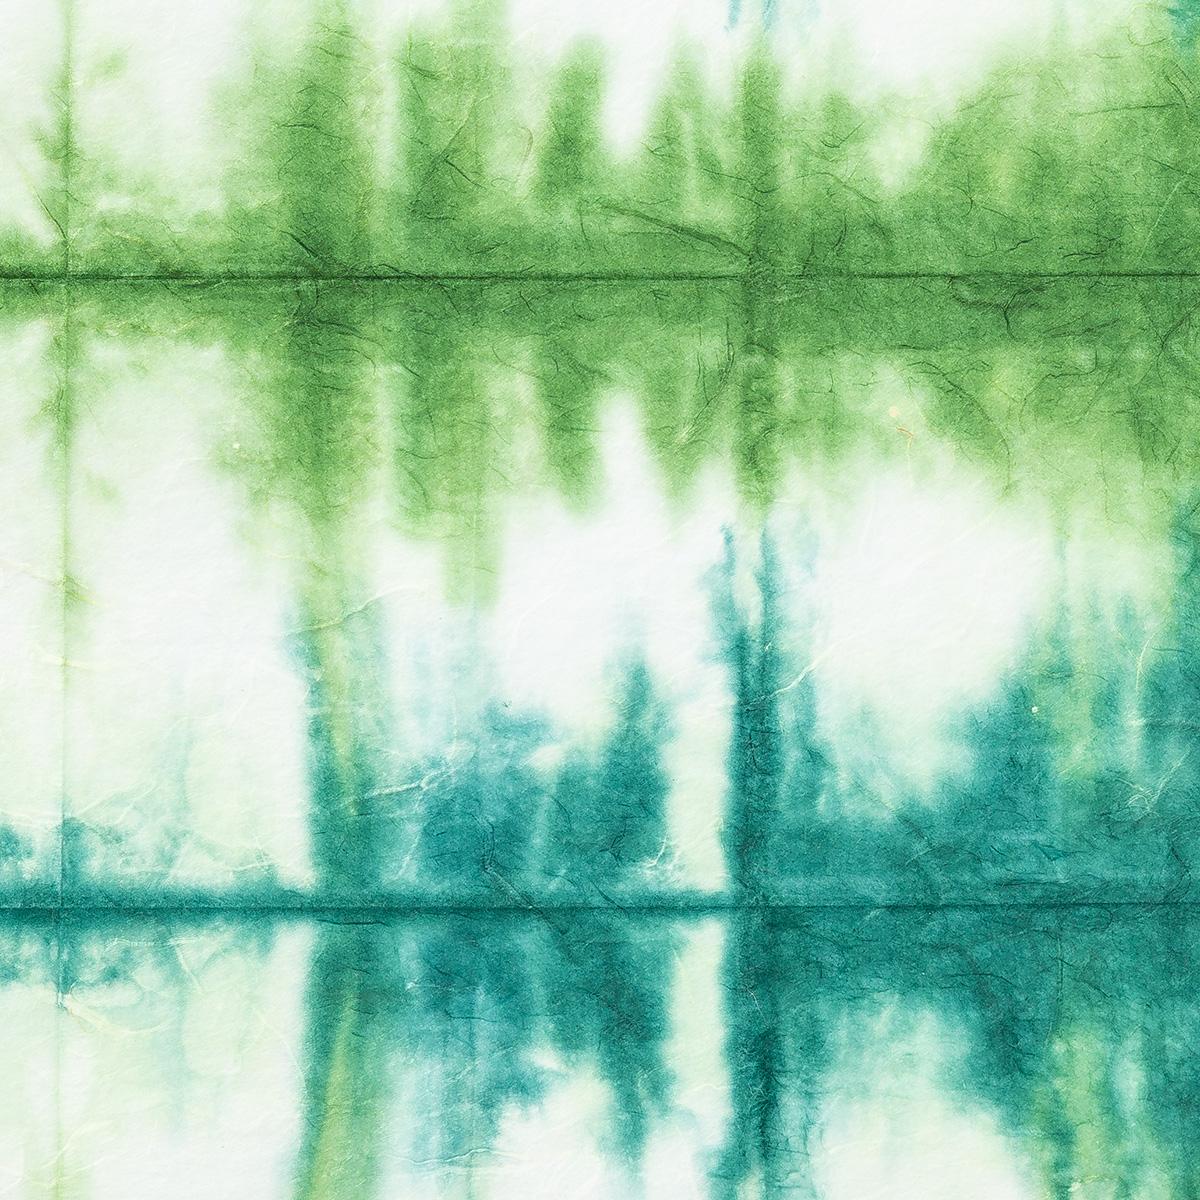 楮6匁 雲竜紙 板締め No.18